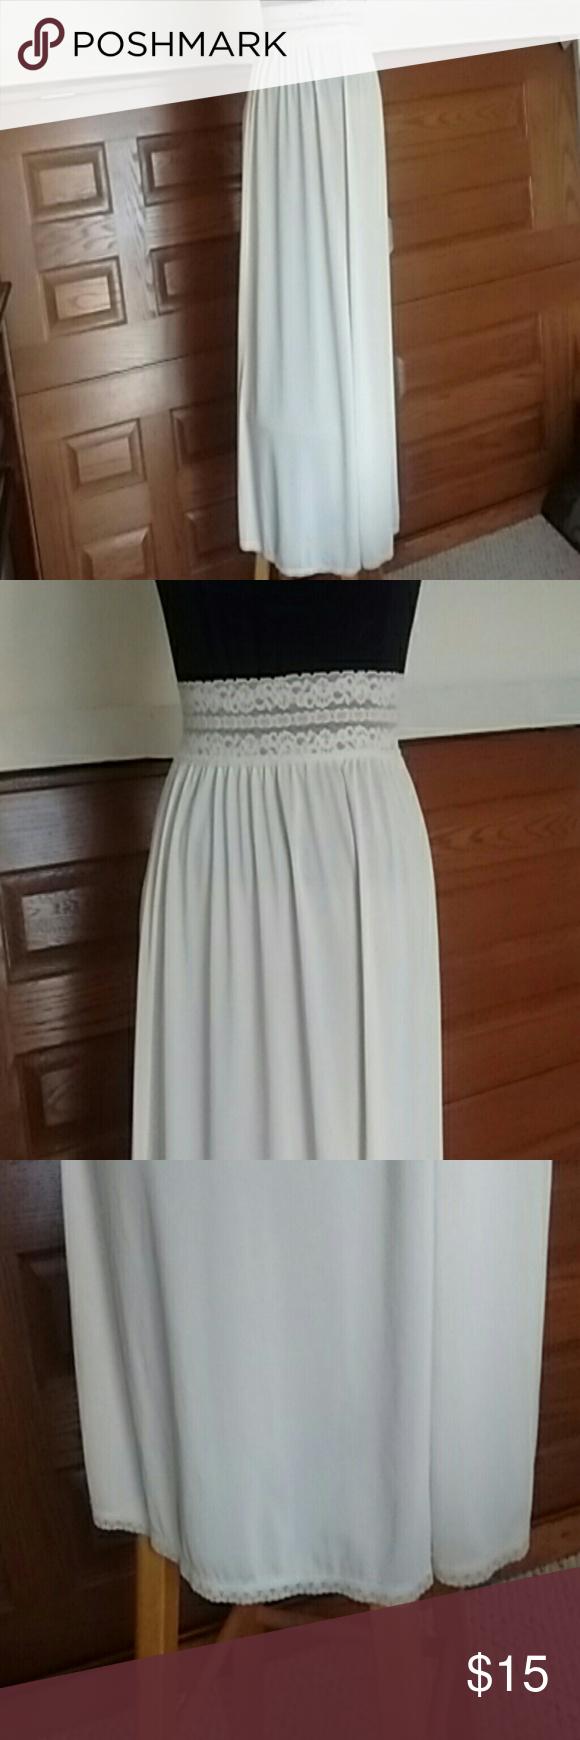 Vintage Cream Maxi Half Slip Lorraine Maxi Dresses And Customer